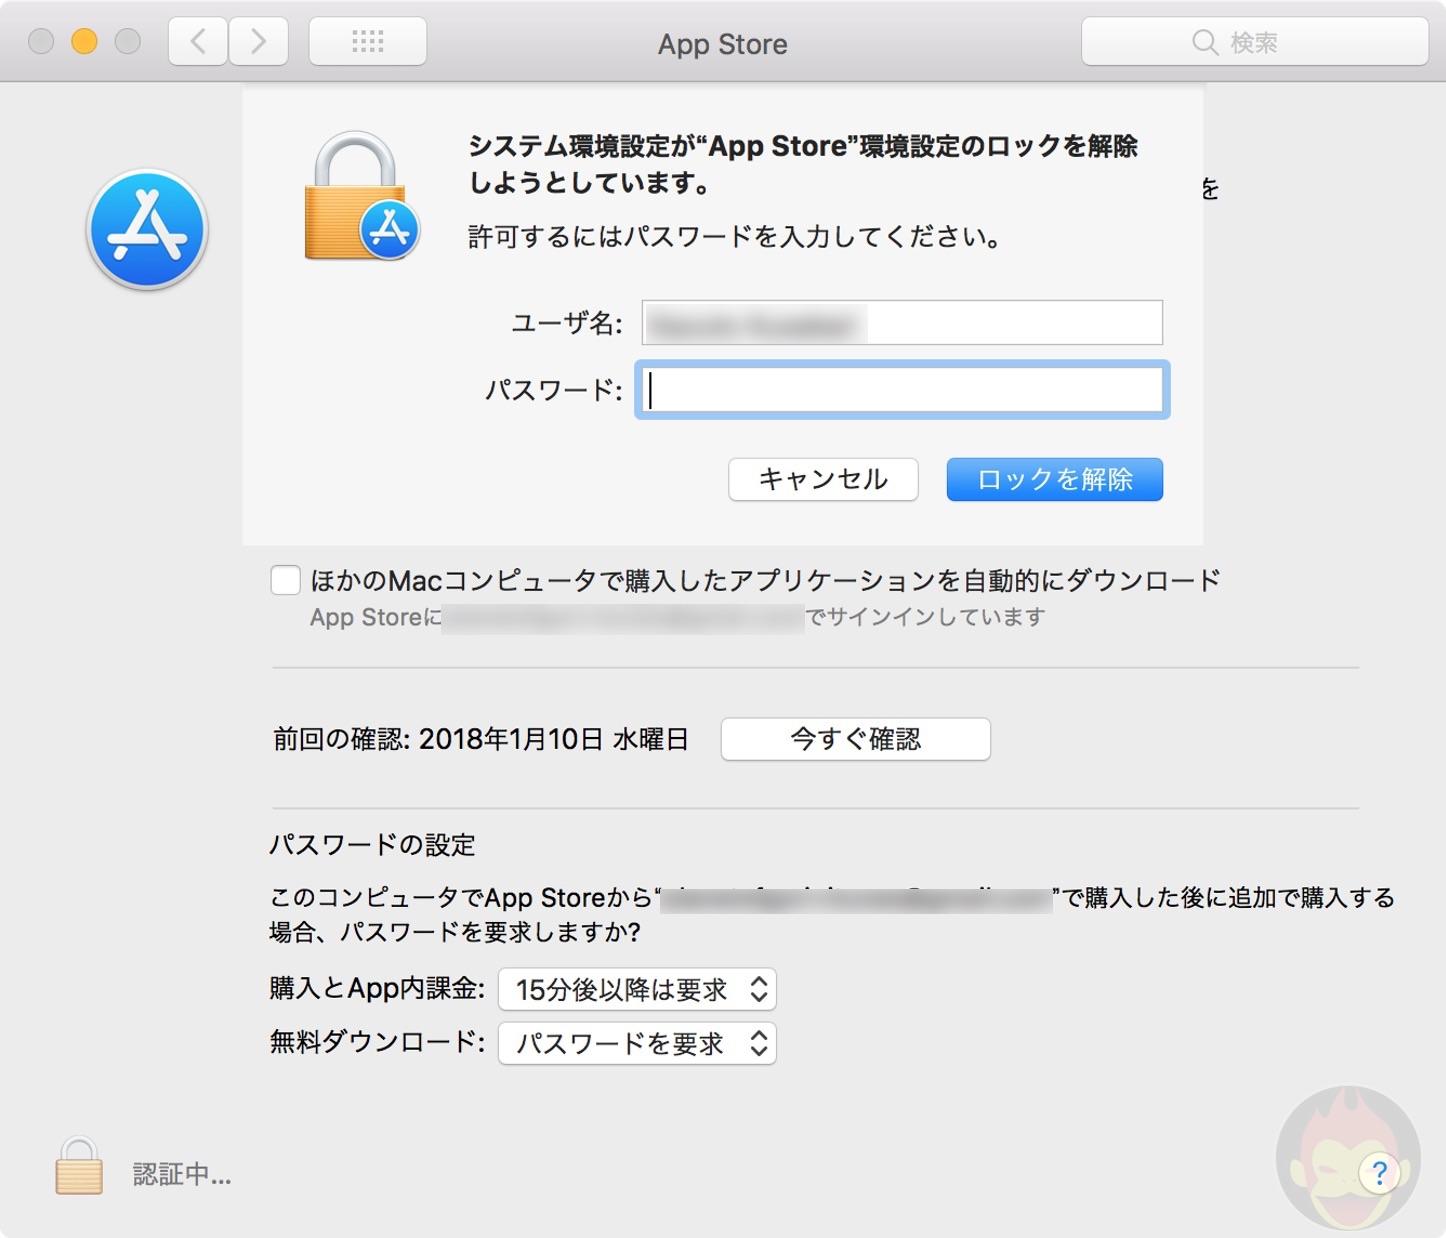 App Store Bug Found in macOSHighSierra